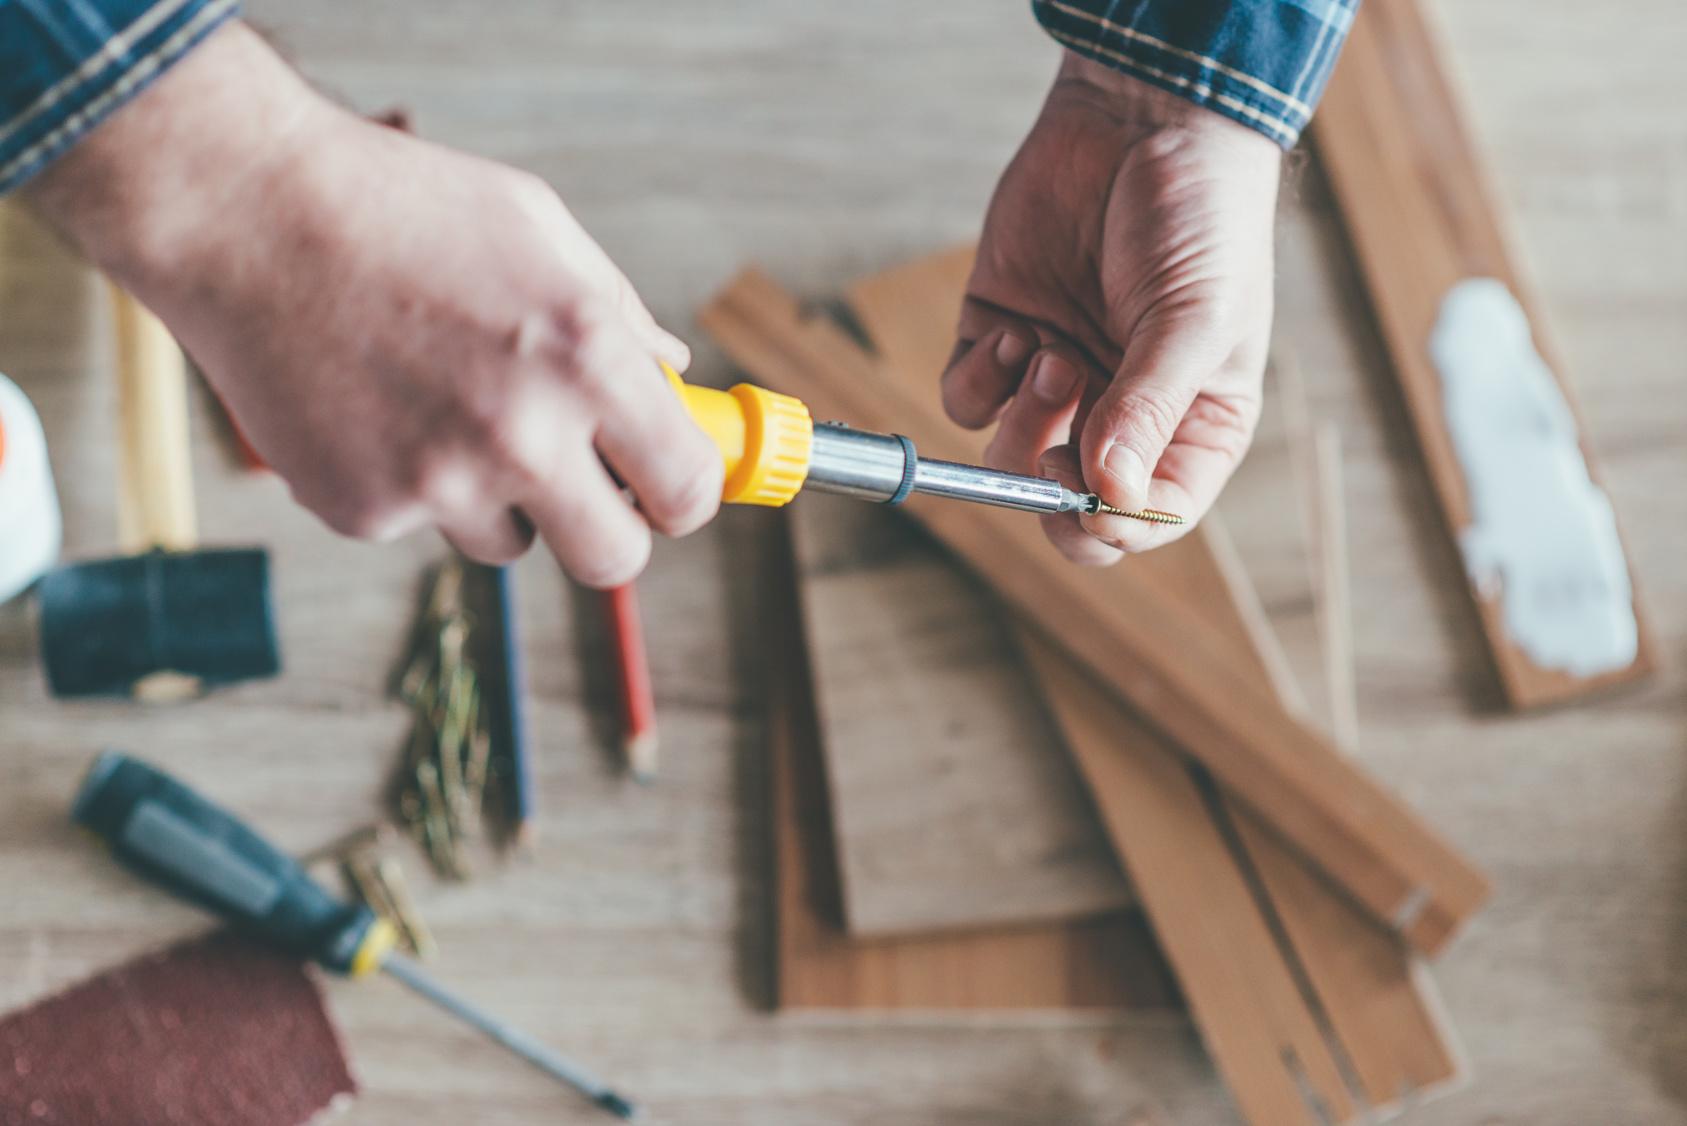 Carpenter holding a screwdriver